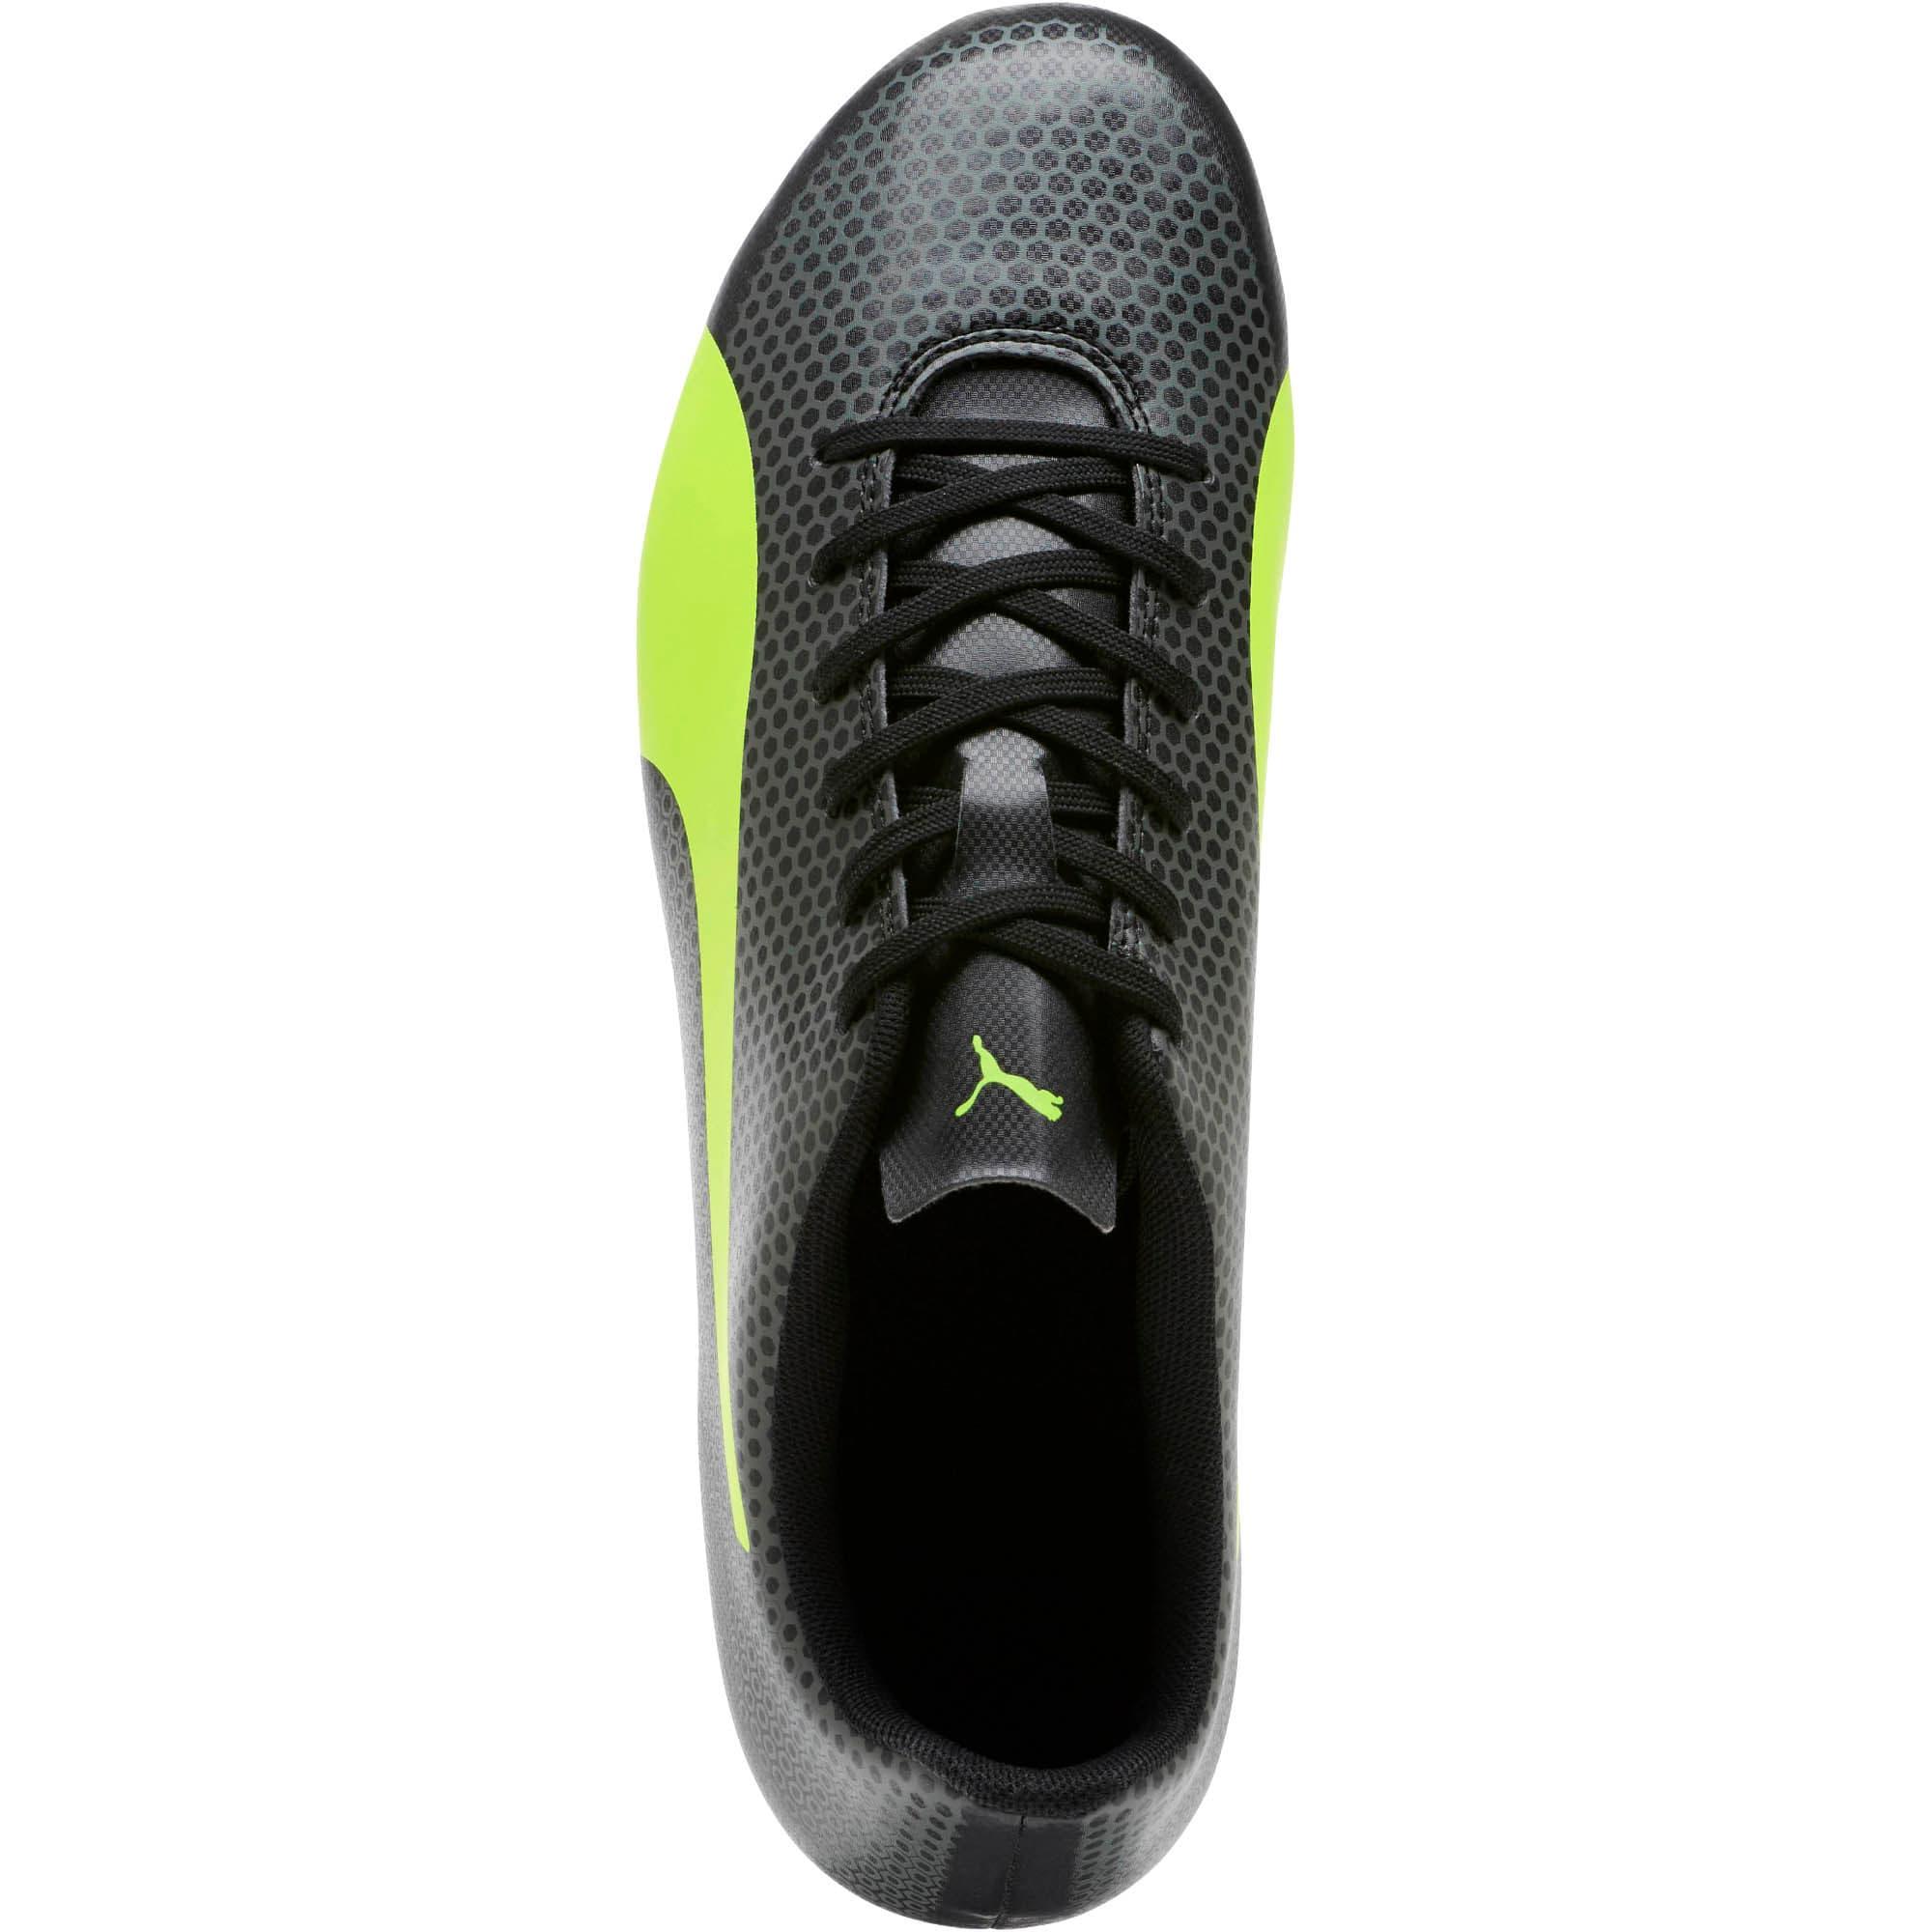 Thumbnail 5 of PUMA Spirit FG Firm Ground Men's Soccer Cleats, Black-Yellow-Gray, medium